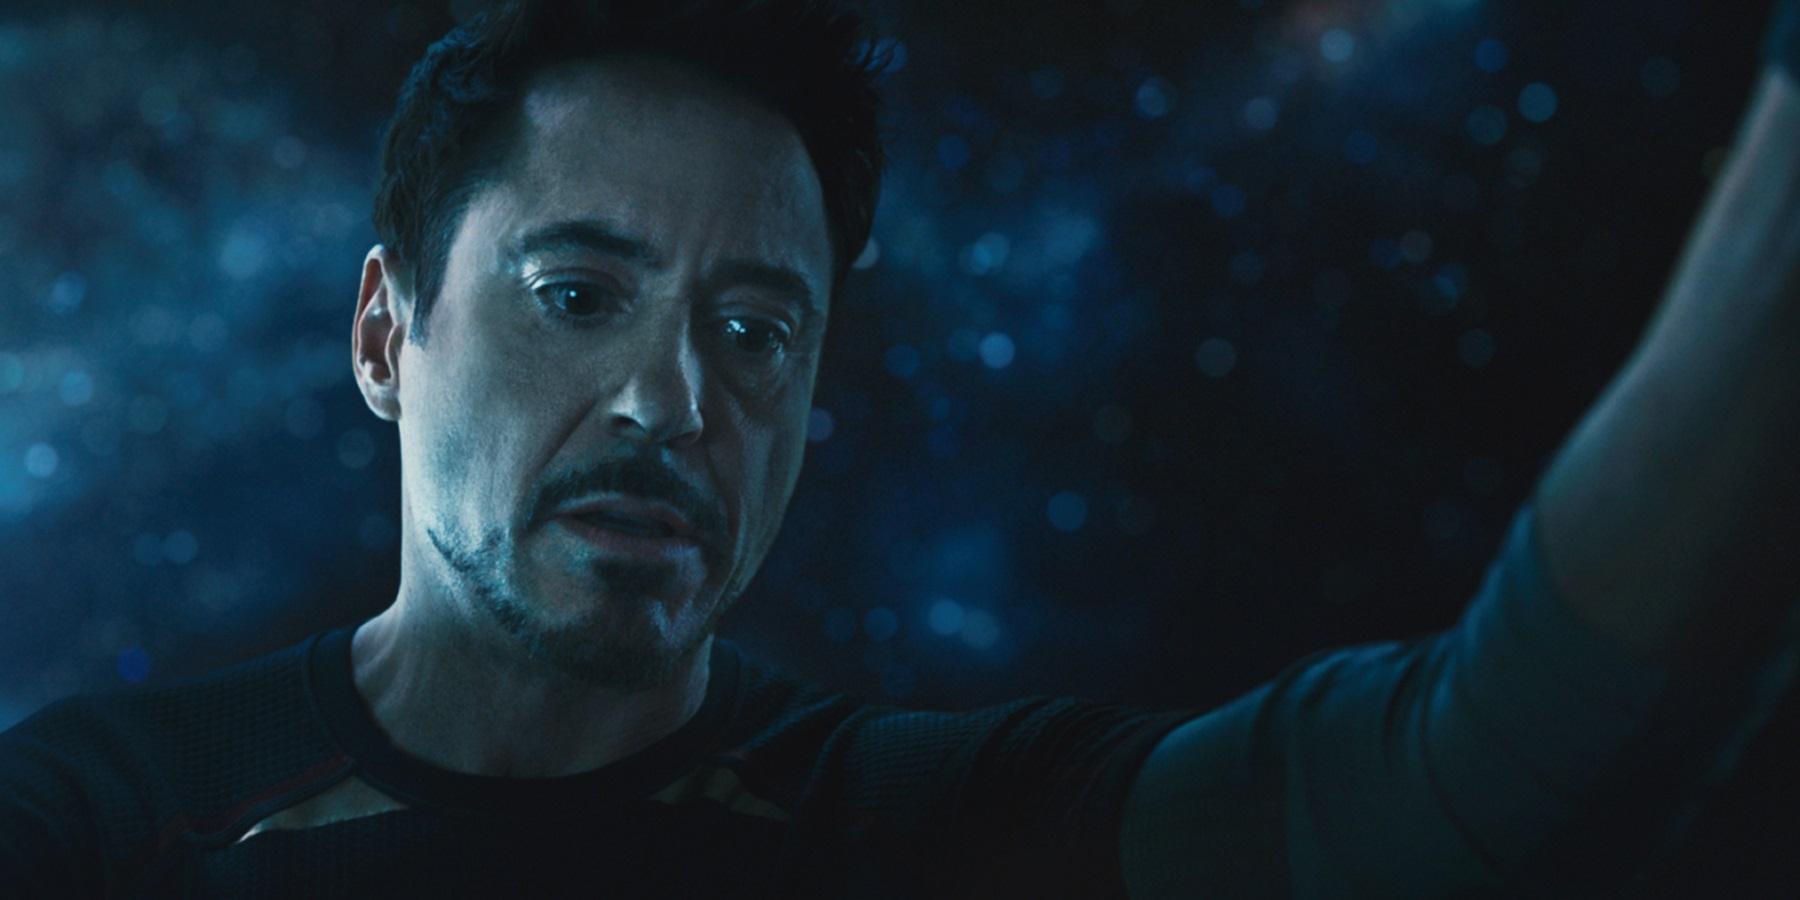 Artigo Vingadores: Ultimato COM SPOILERS, Tony Stark futuro Era de Ultron, Delfos